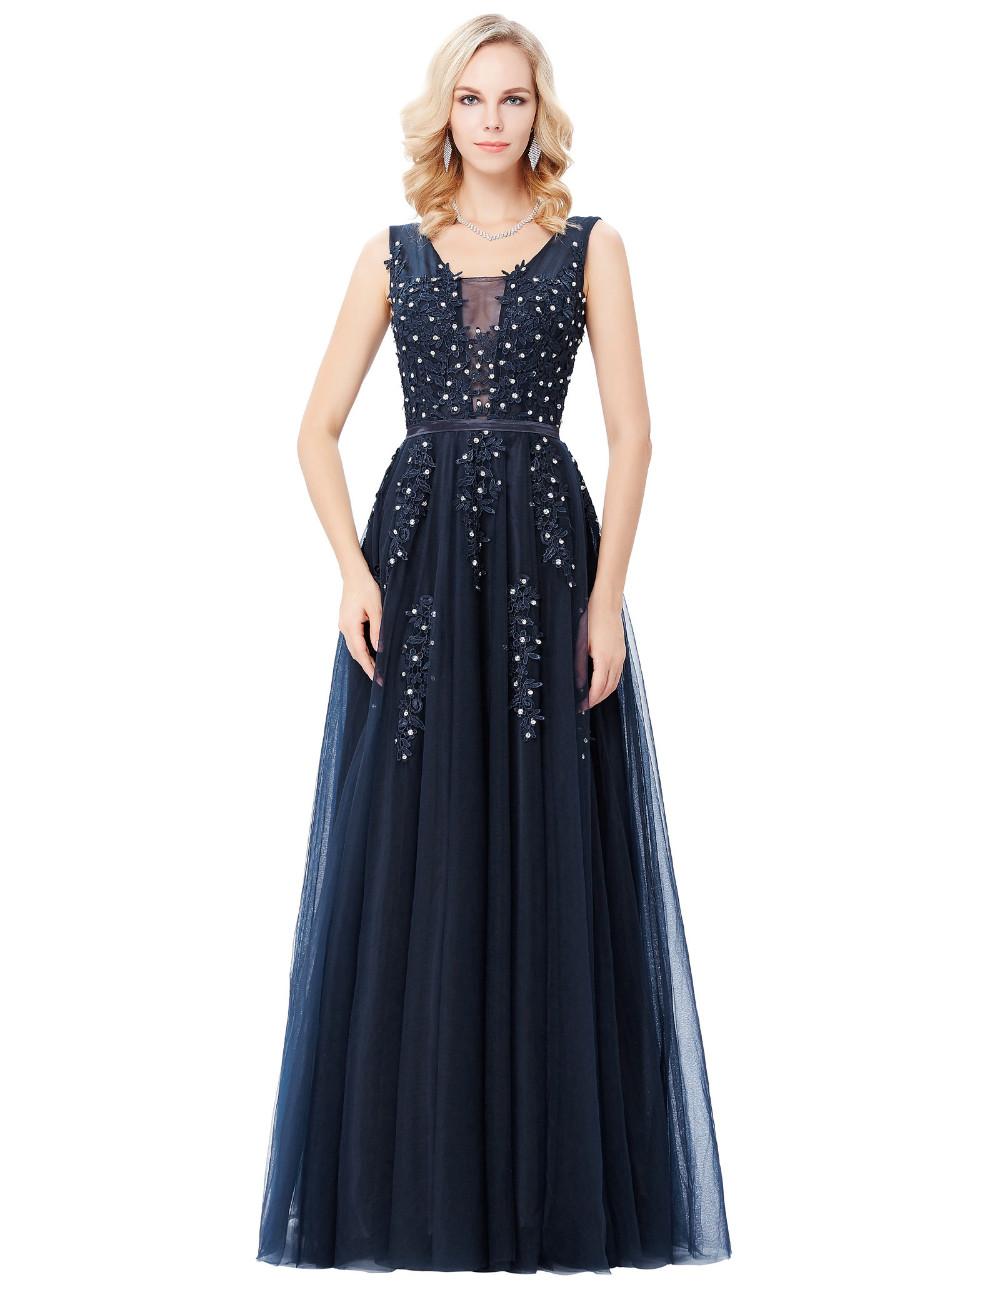 Grace Karin Tulle Appliques Celebrity Prom Dress Sexy V Back Sleeveless Long Royal Blue Robes De Soiree 2017 Longue Prom Dresses 11